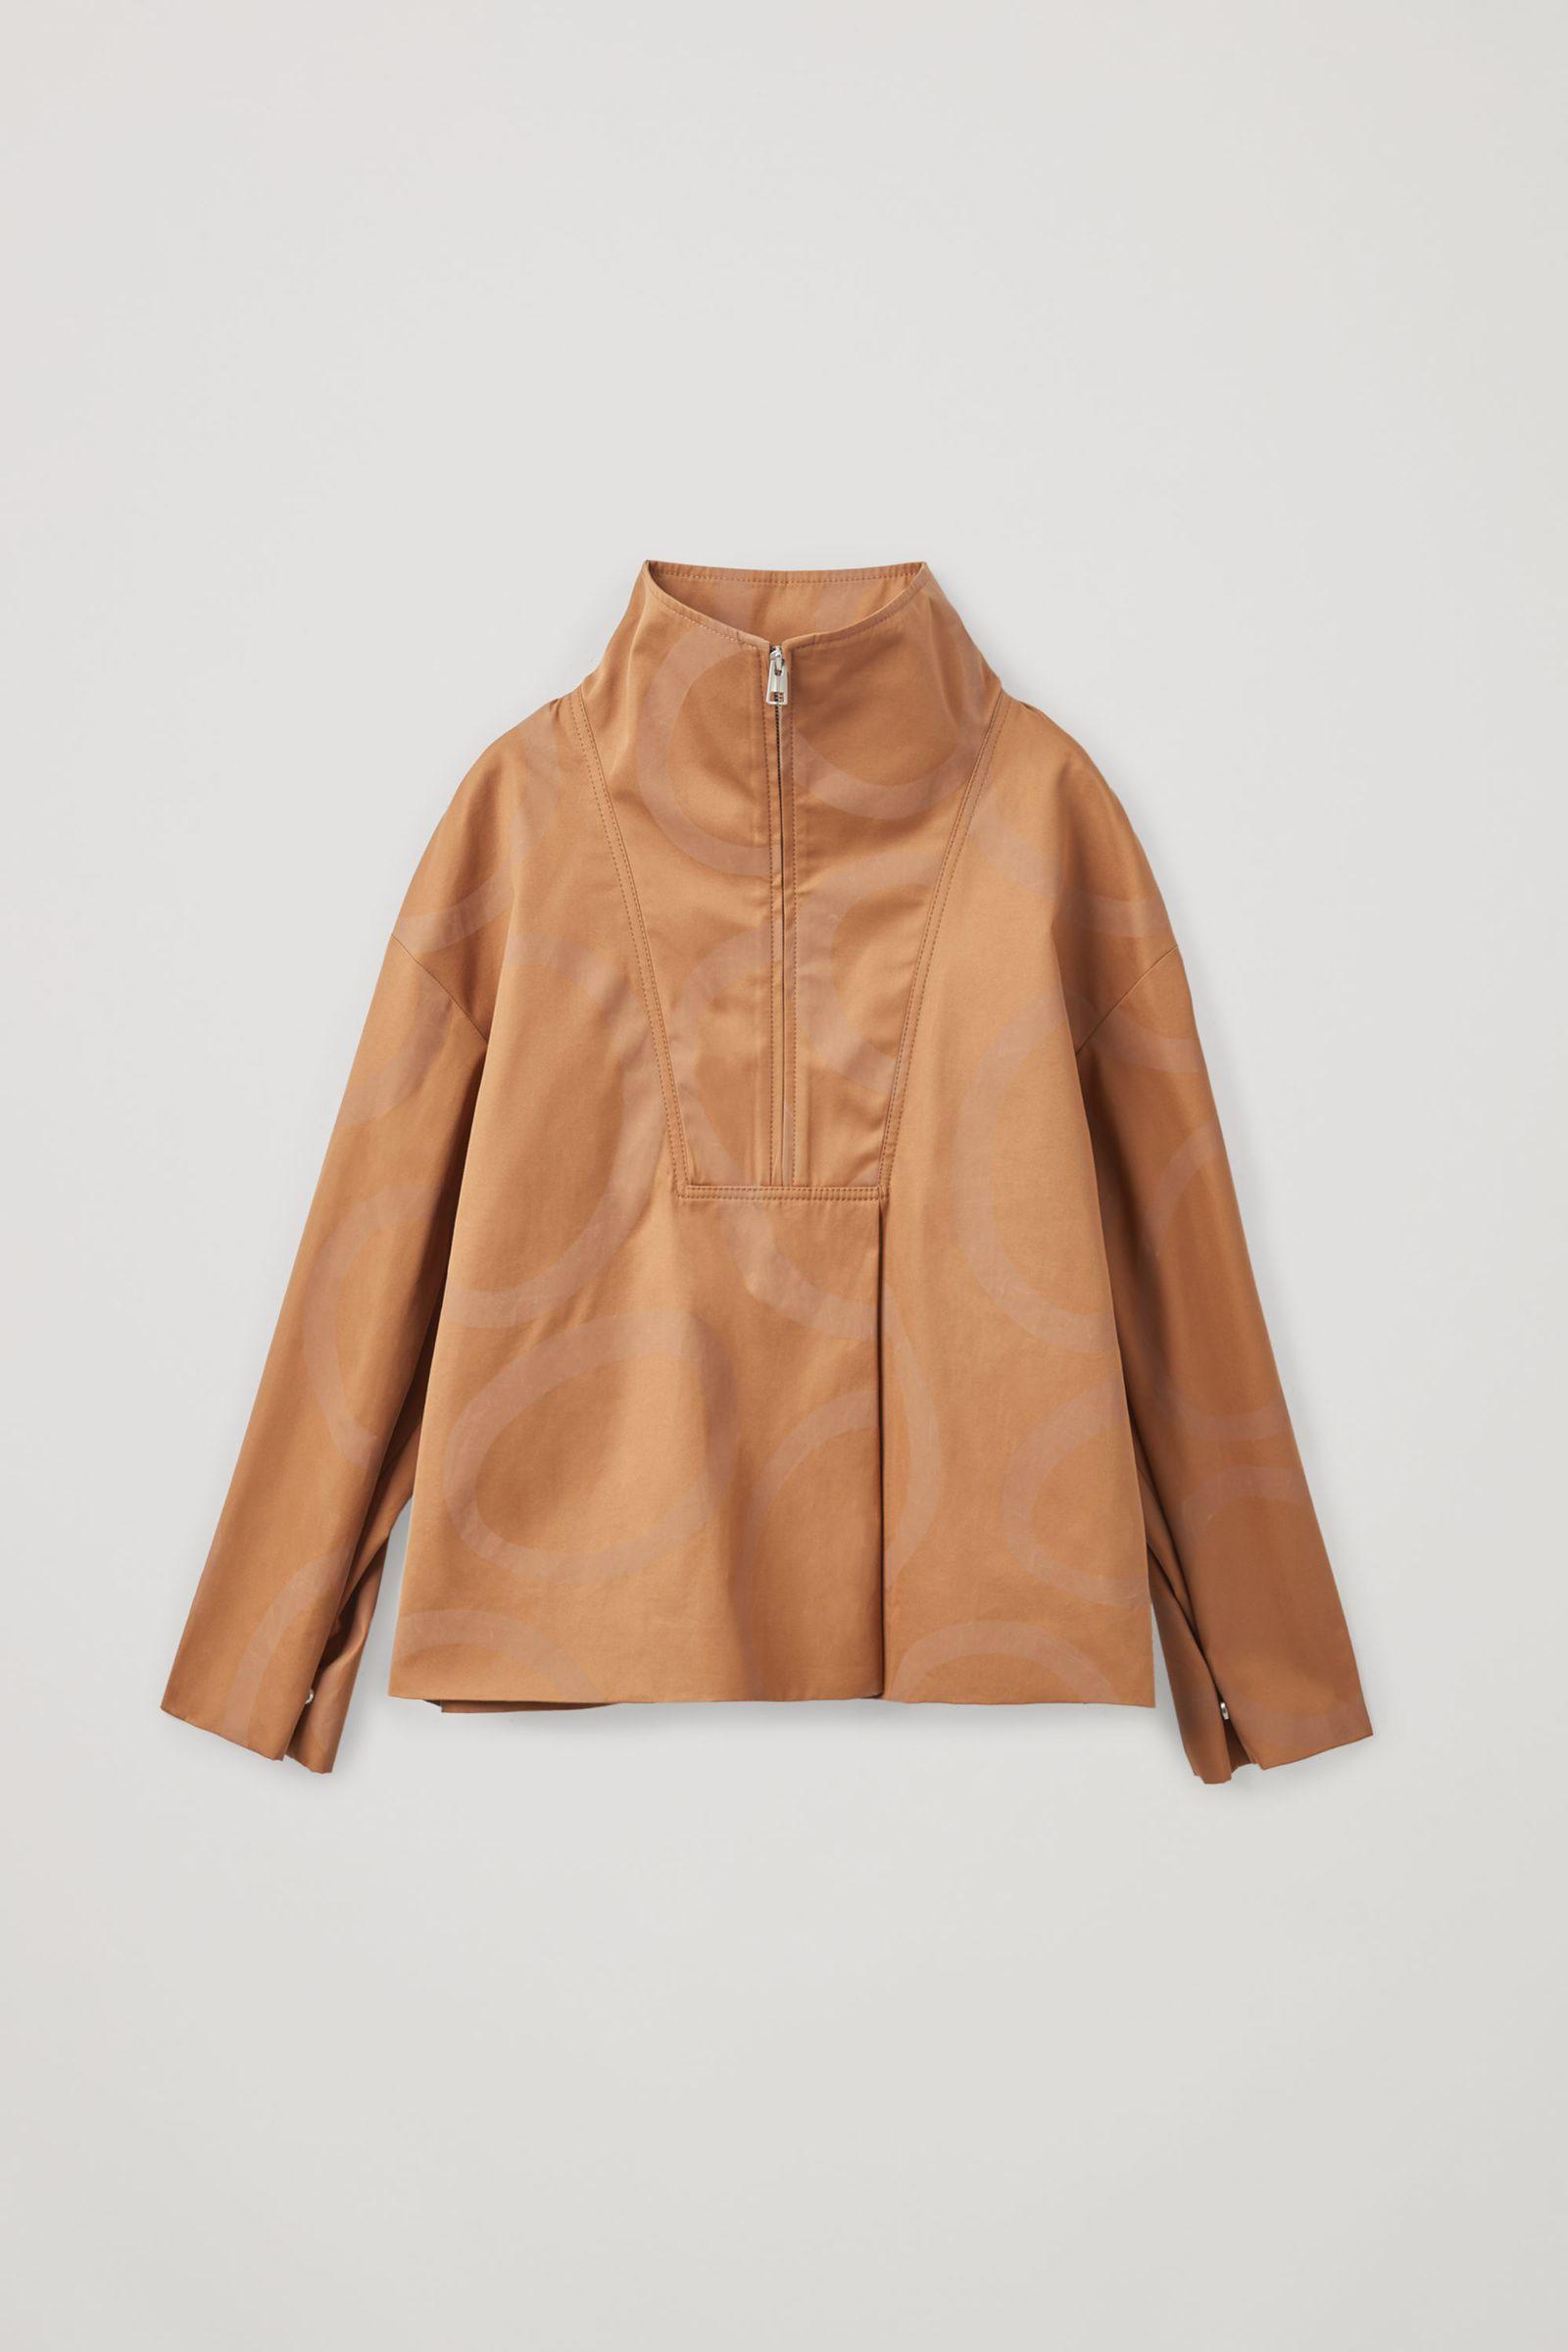 COS 프린티드 코튼 재킷의 베이지 / 브라운컬러 Product입니다.